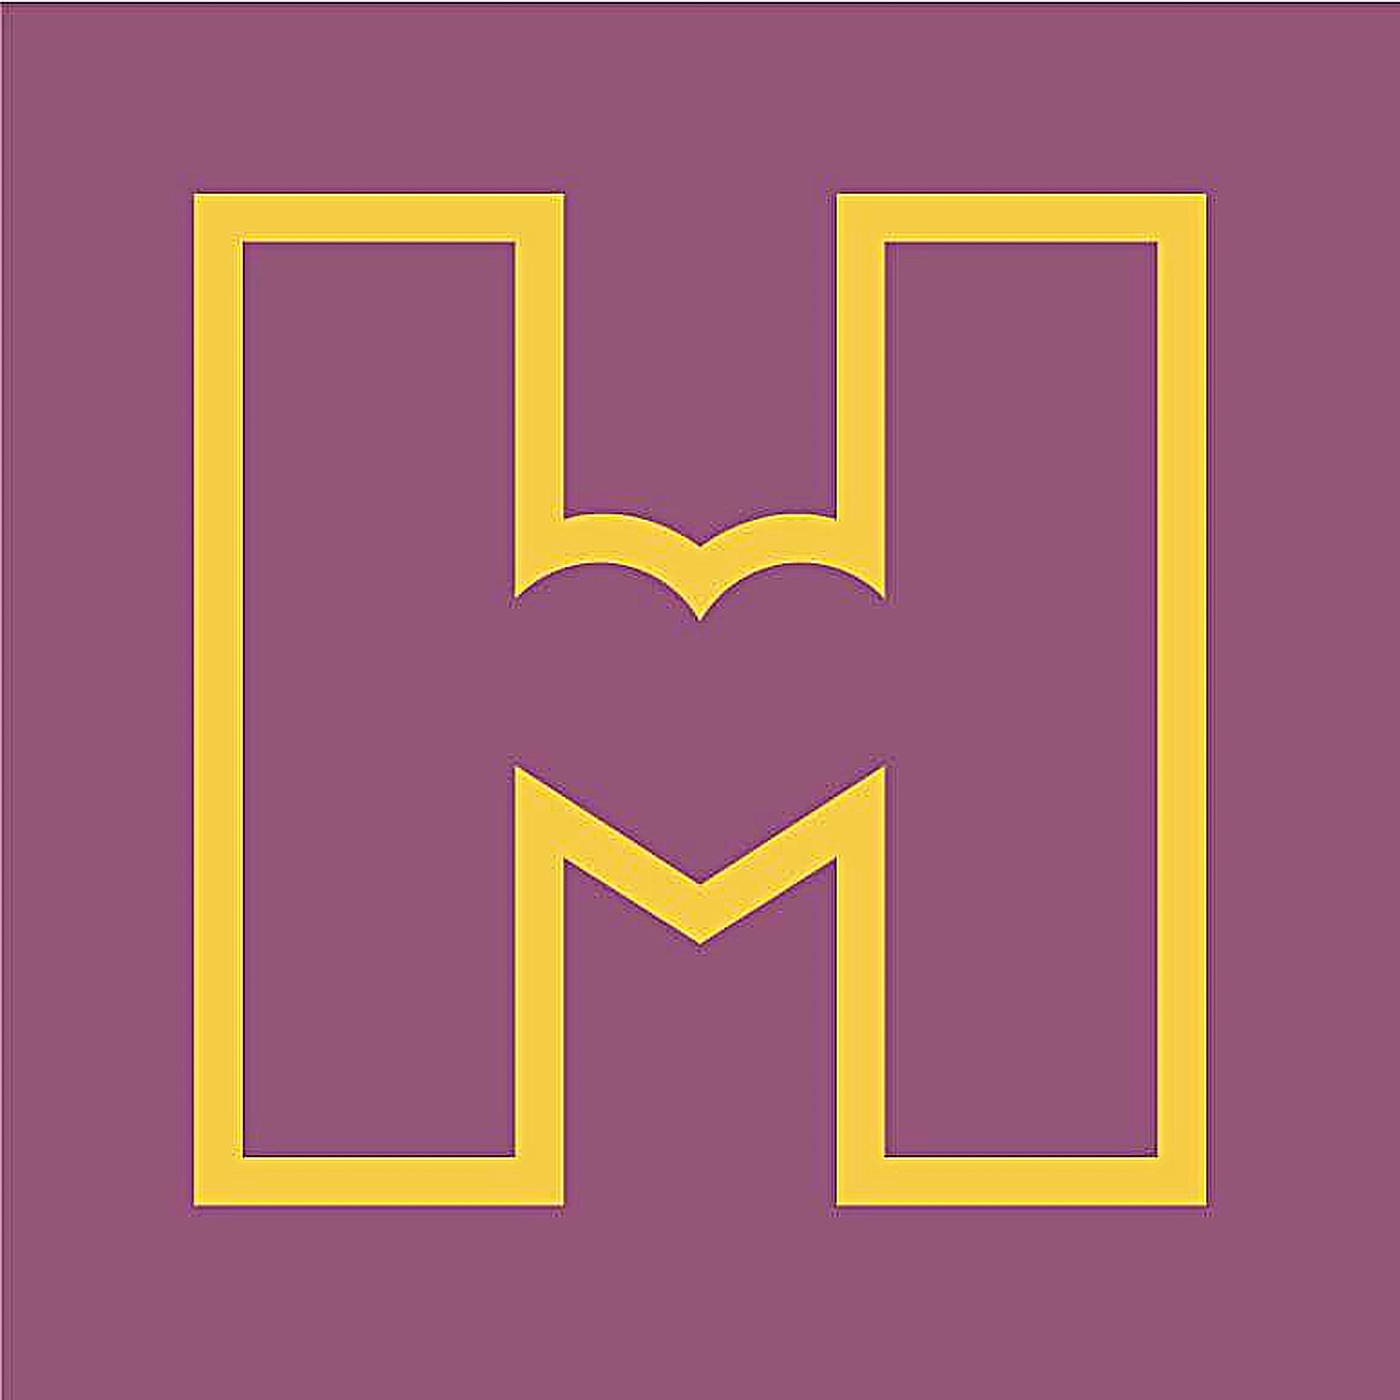 Helsingin kaupunginmuseon podcast-sarjat